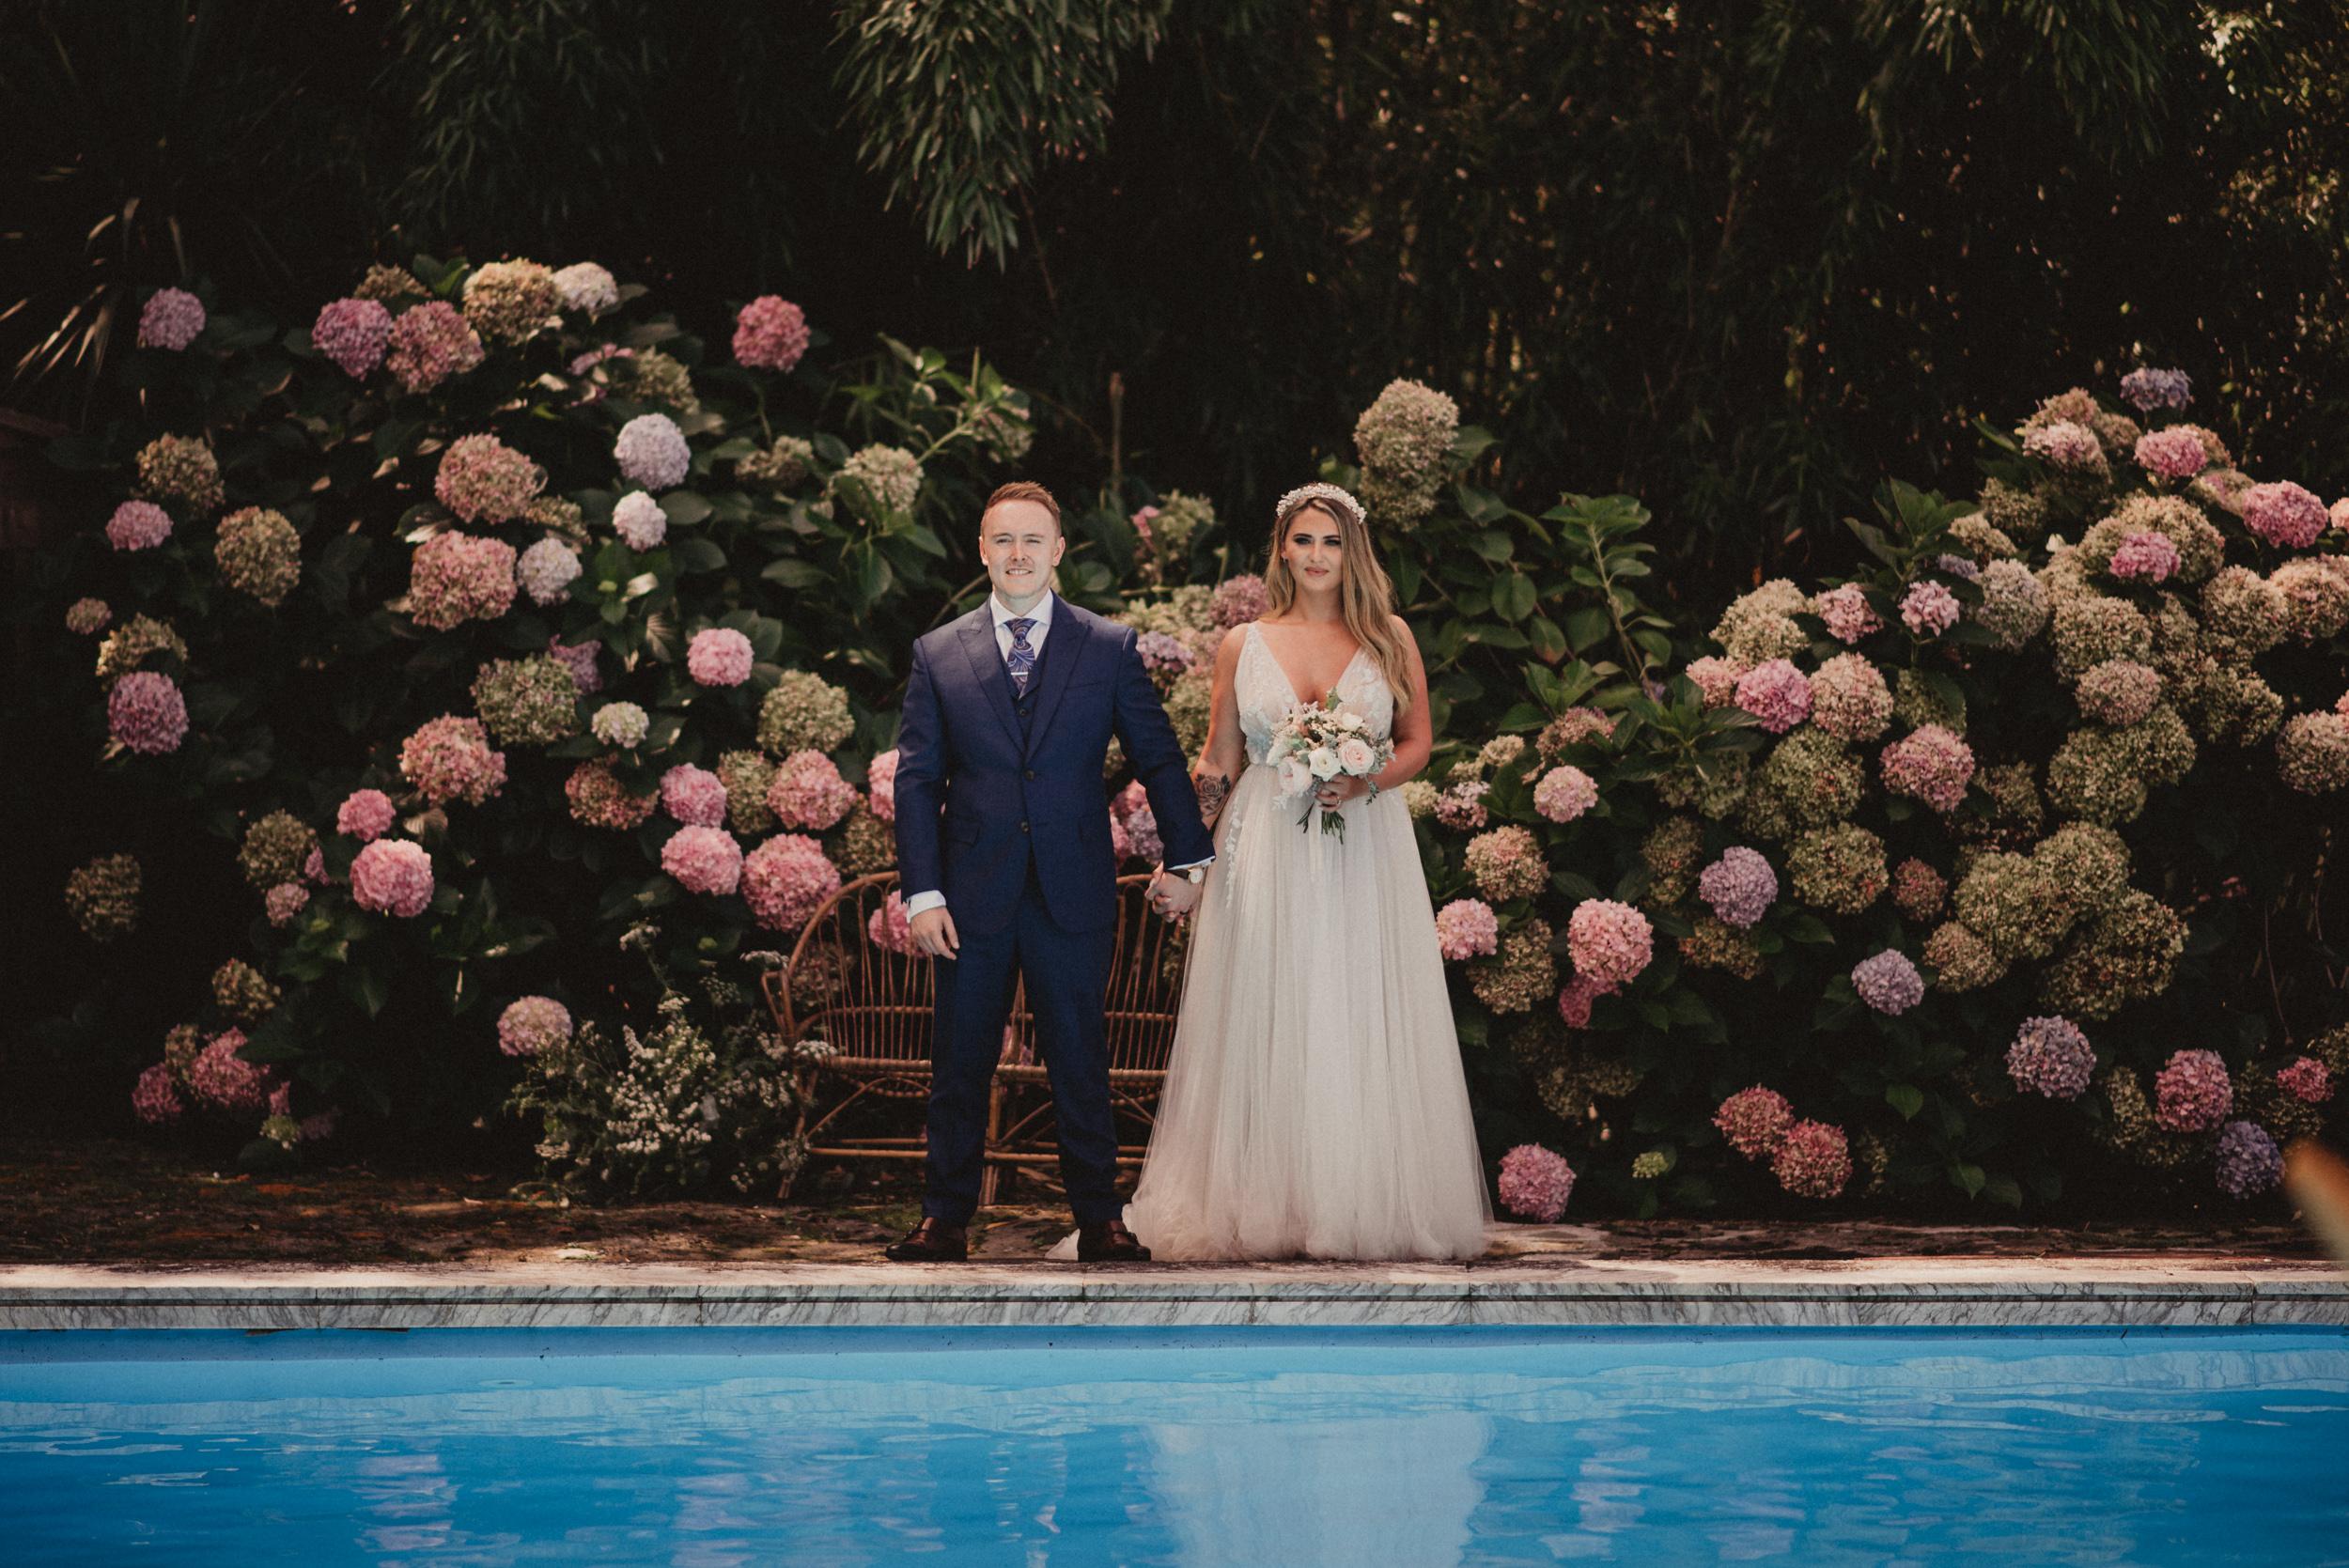 Claudia & Ger - FINCA ITXASBIDE - SAN SEBASTIÁN